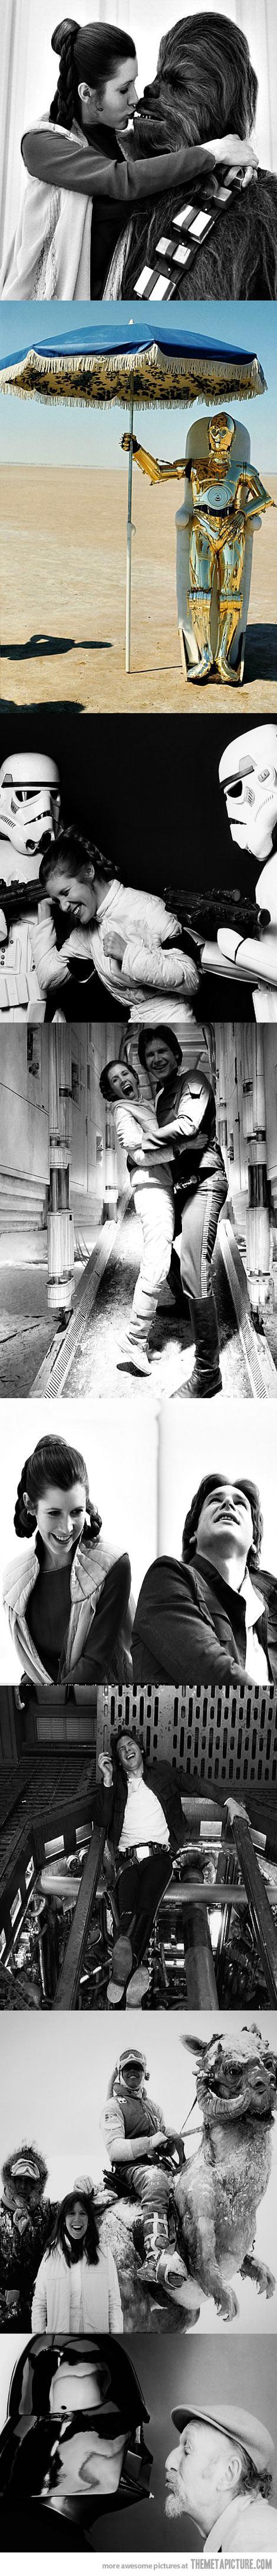 Star Wars. Love.